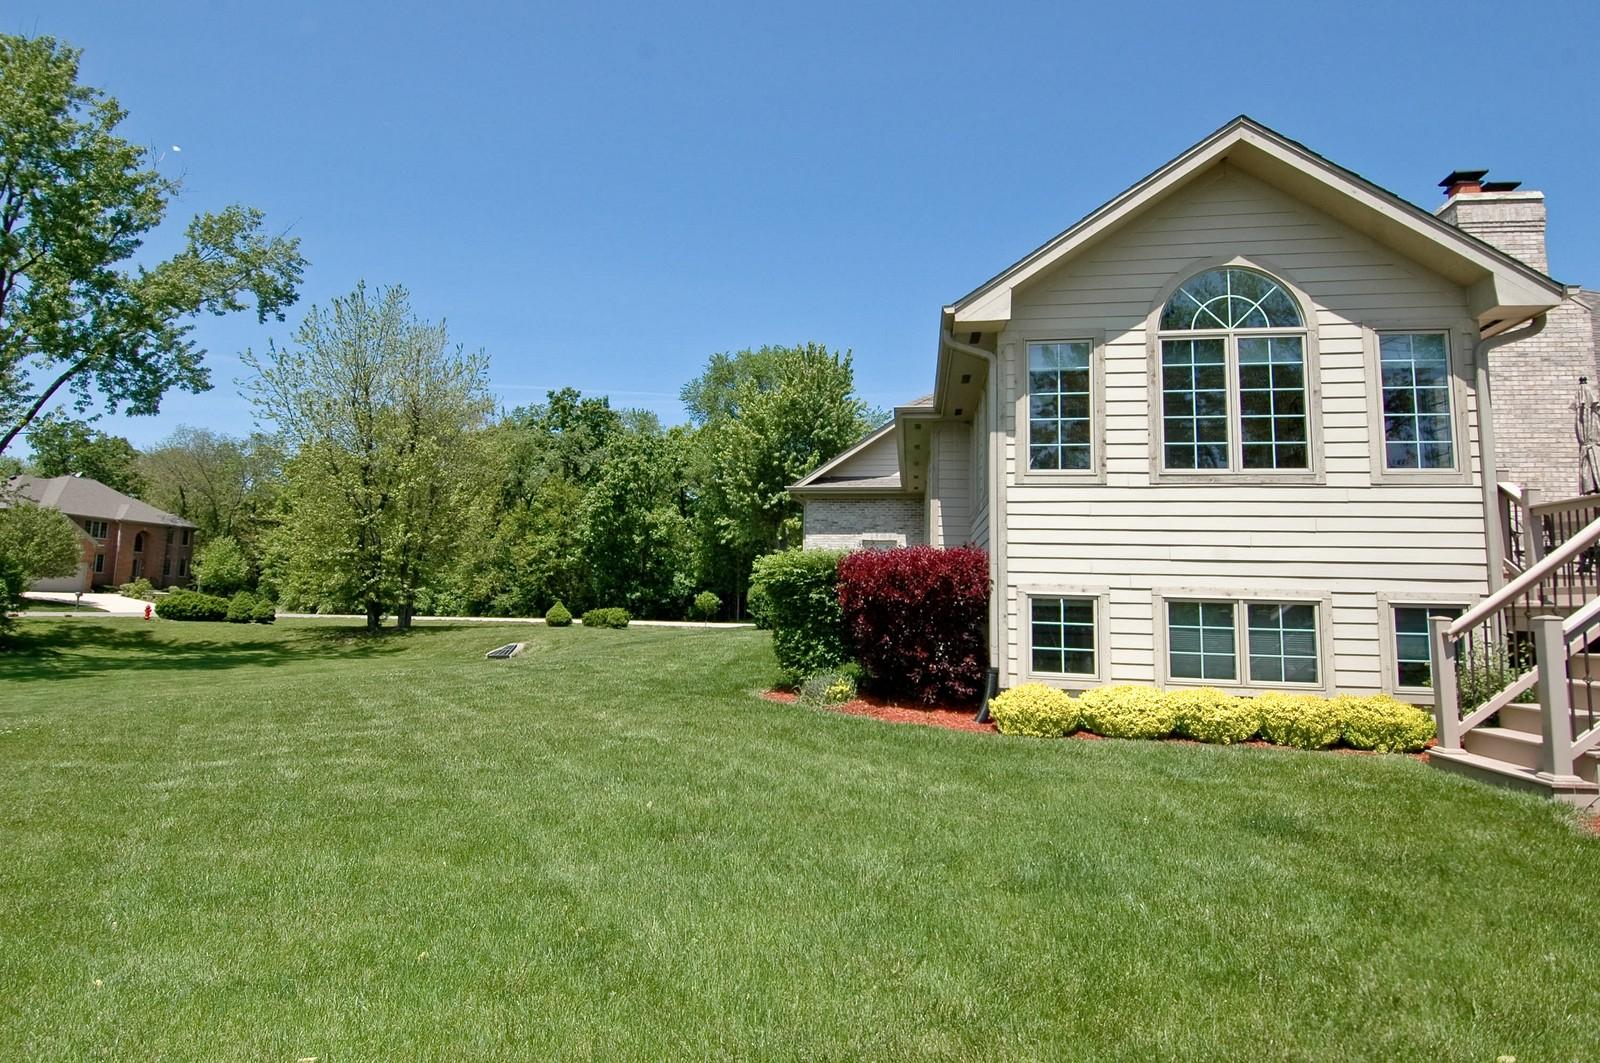 Real Estate Photography - 8719 Shade Tree Circle, Village of Lakewood, IL, 60014 - Side Yard